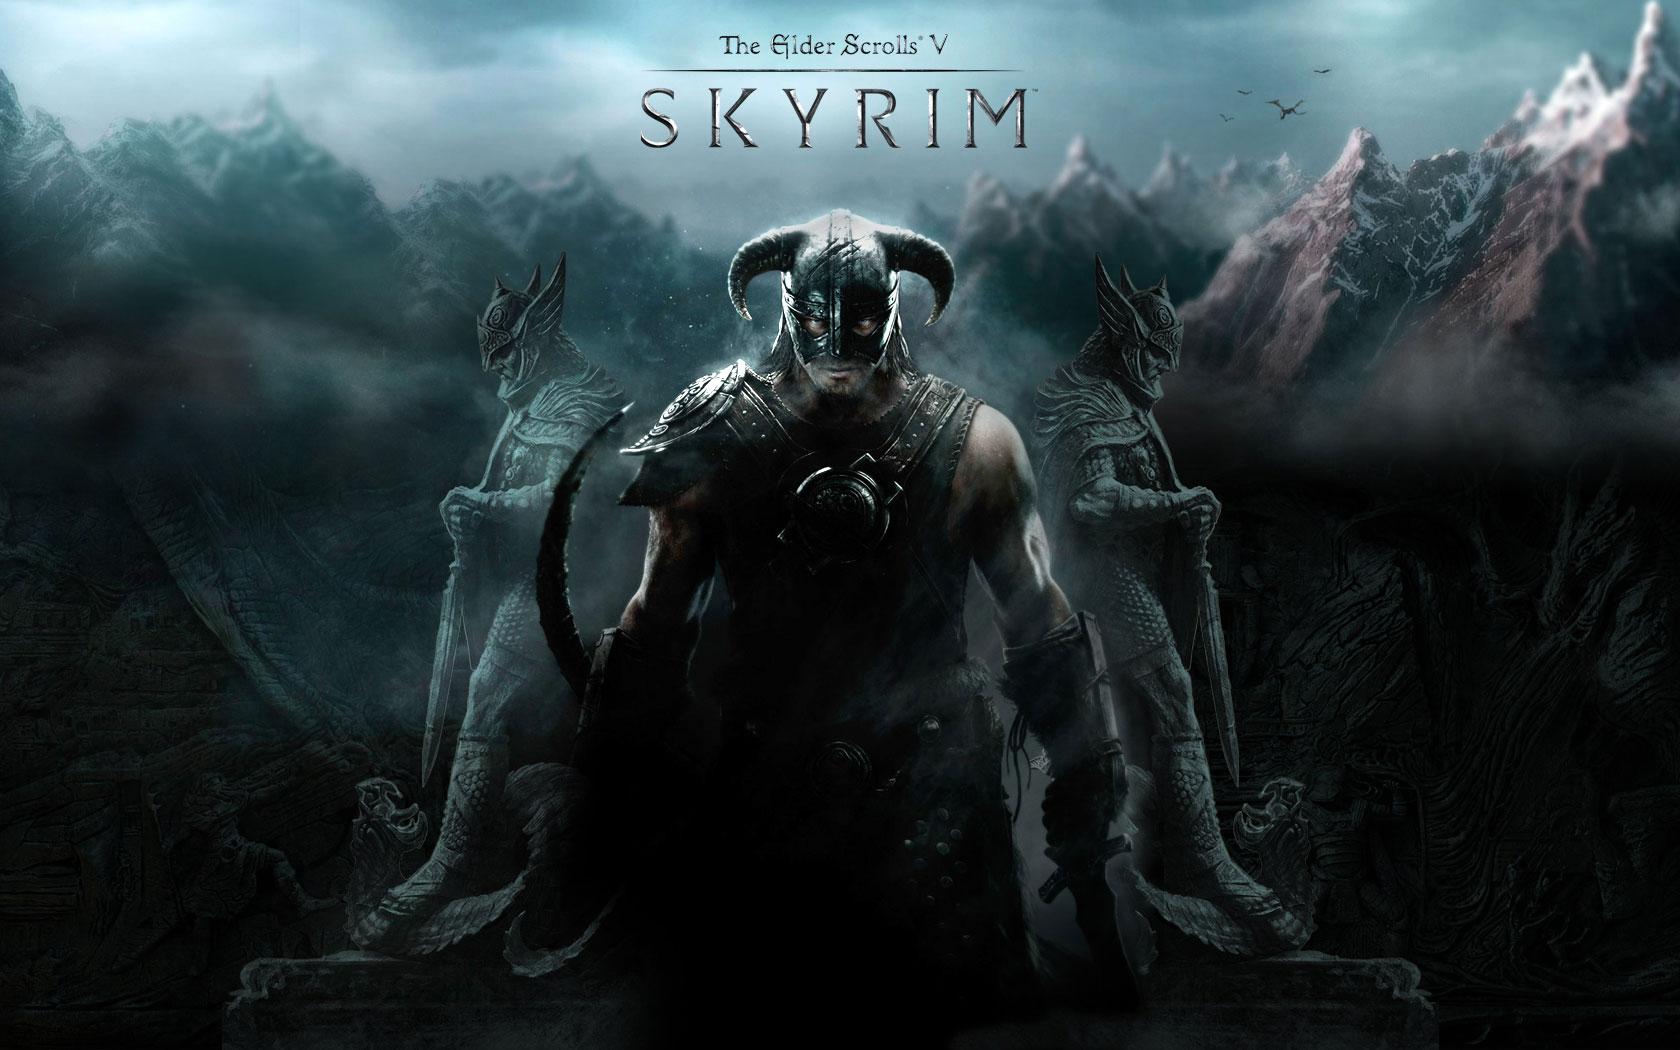 Skyrim video game DVD Cover